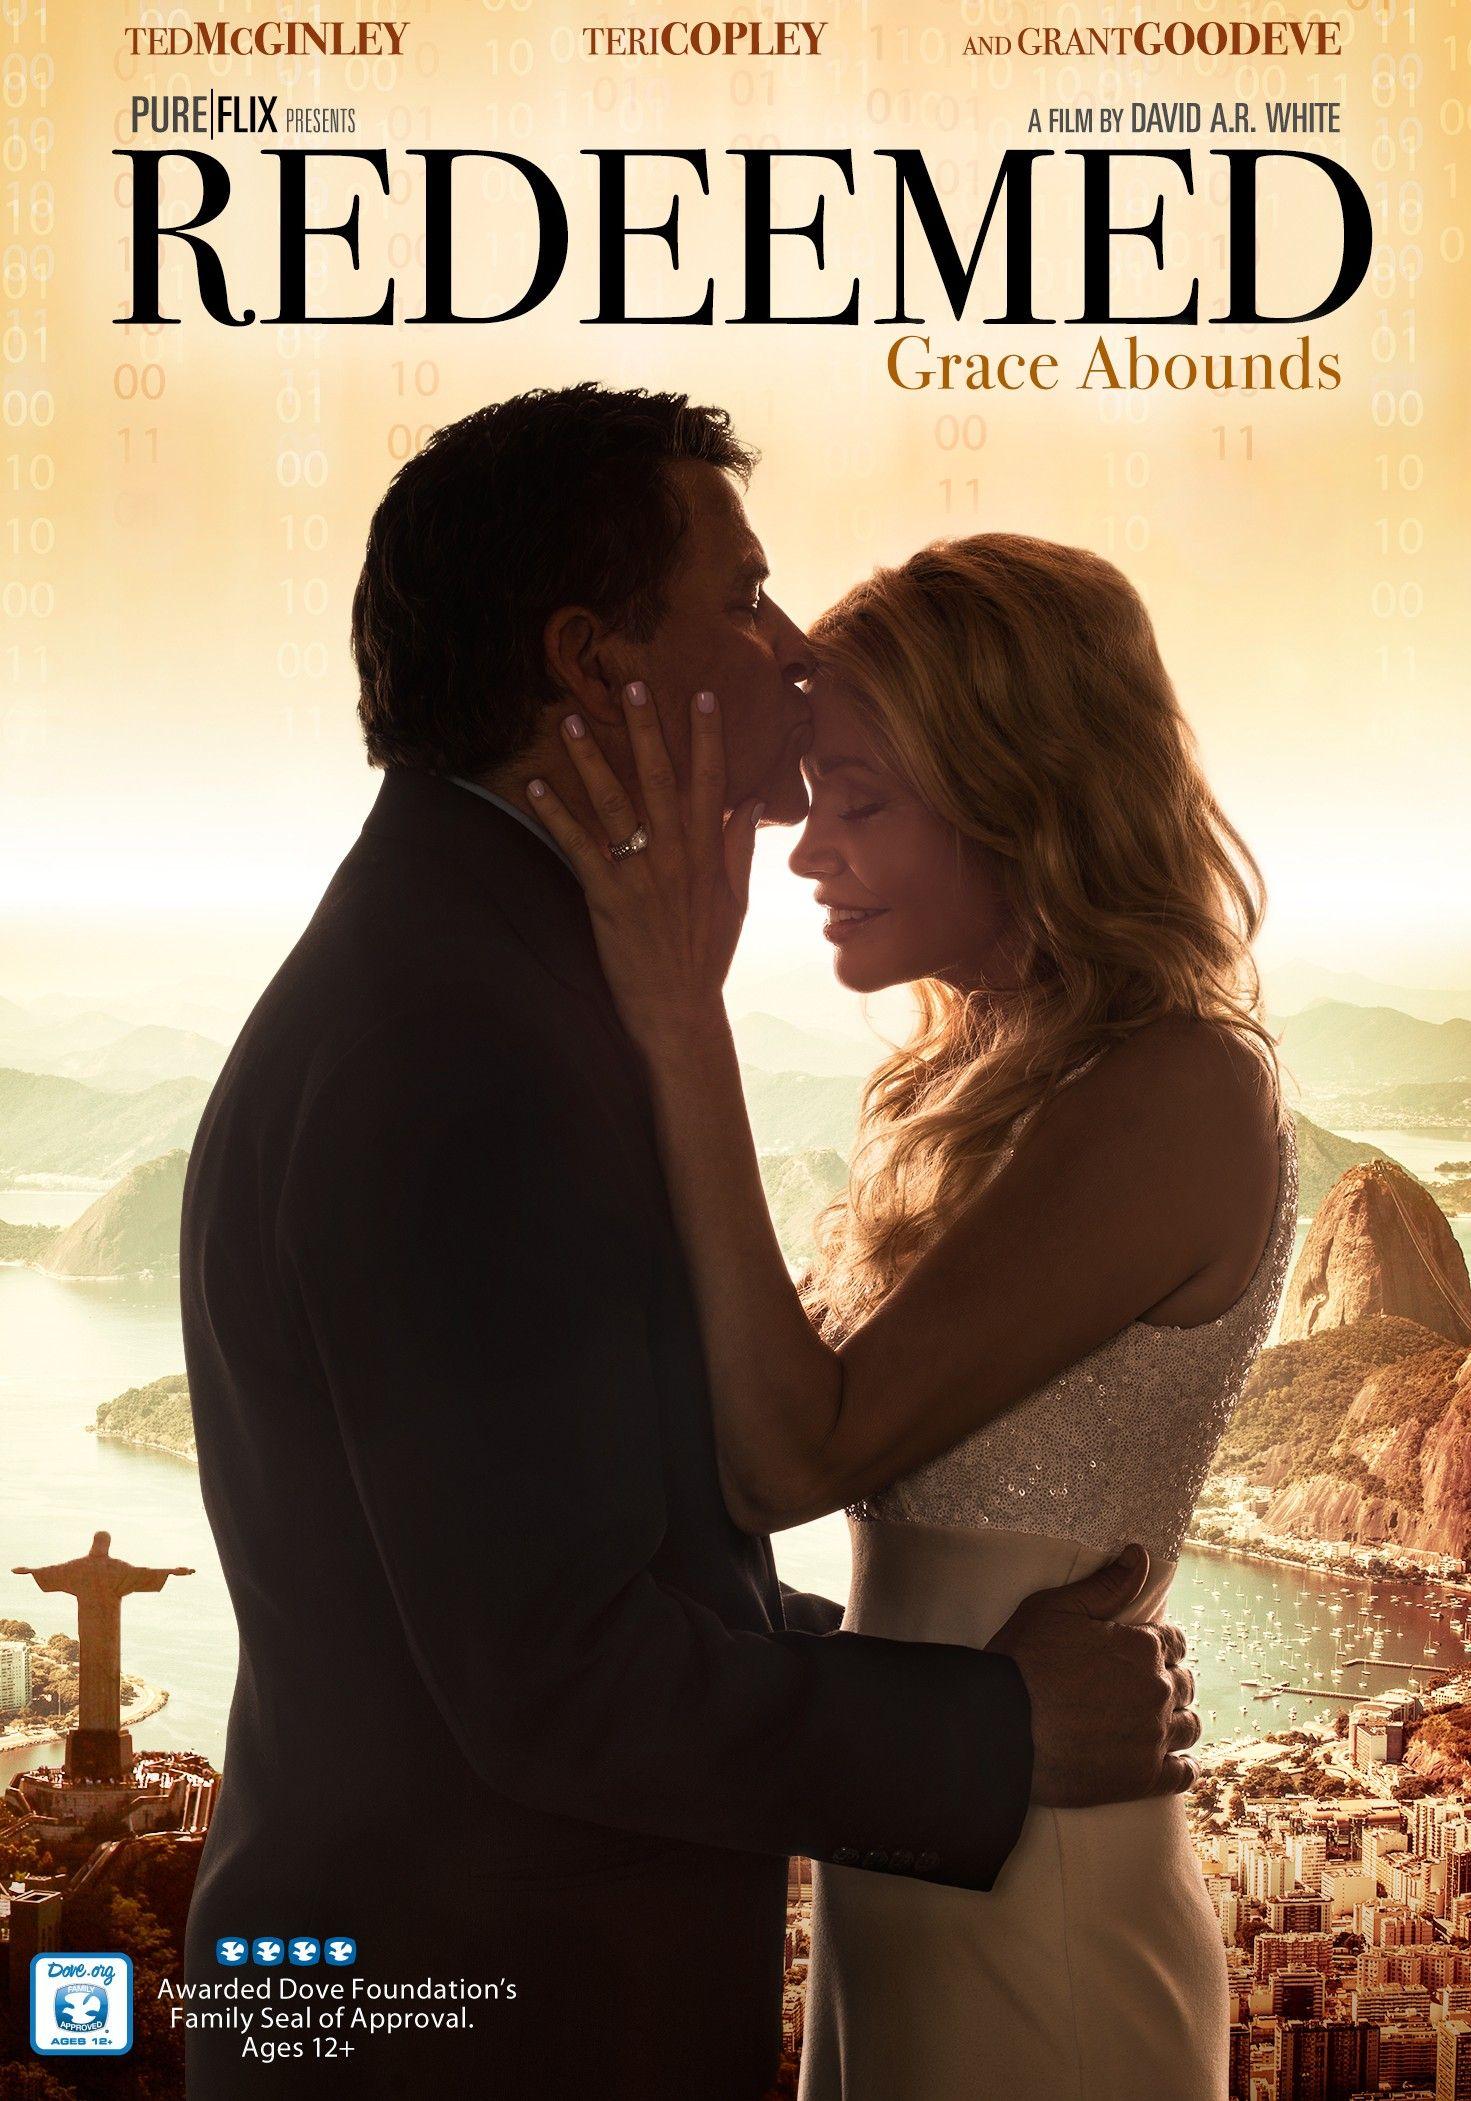 Ana Ayora Age redeemed - christian movie/film dvd pure flix - cfdb